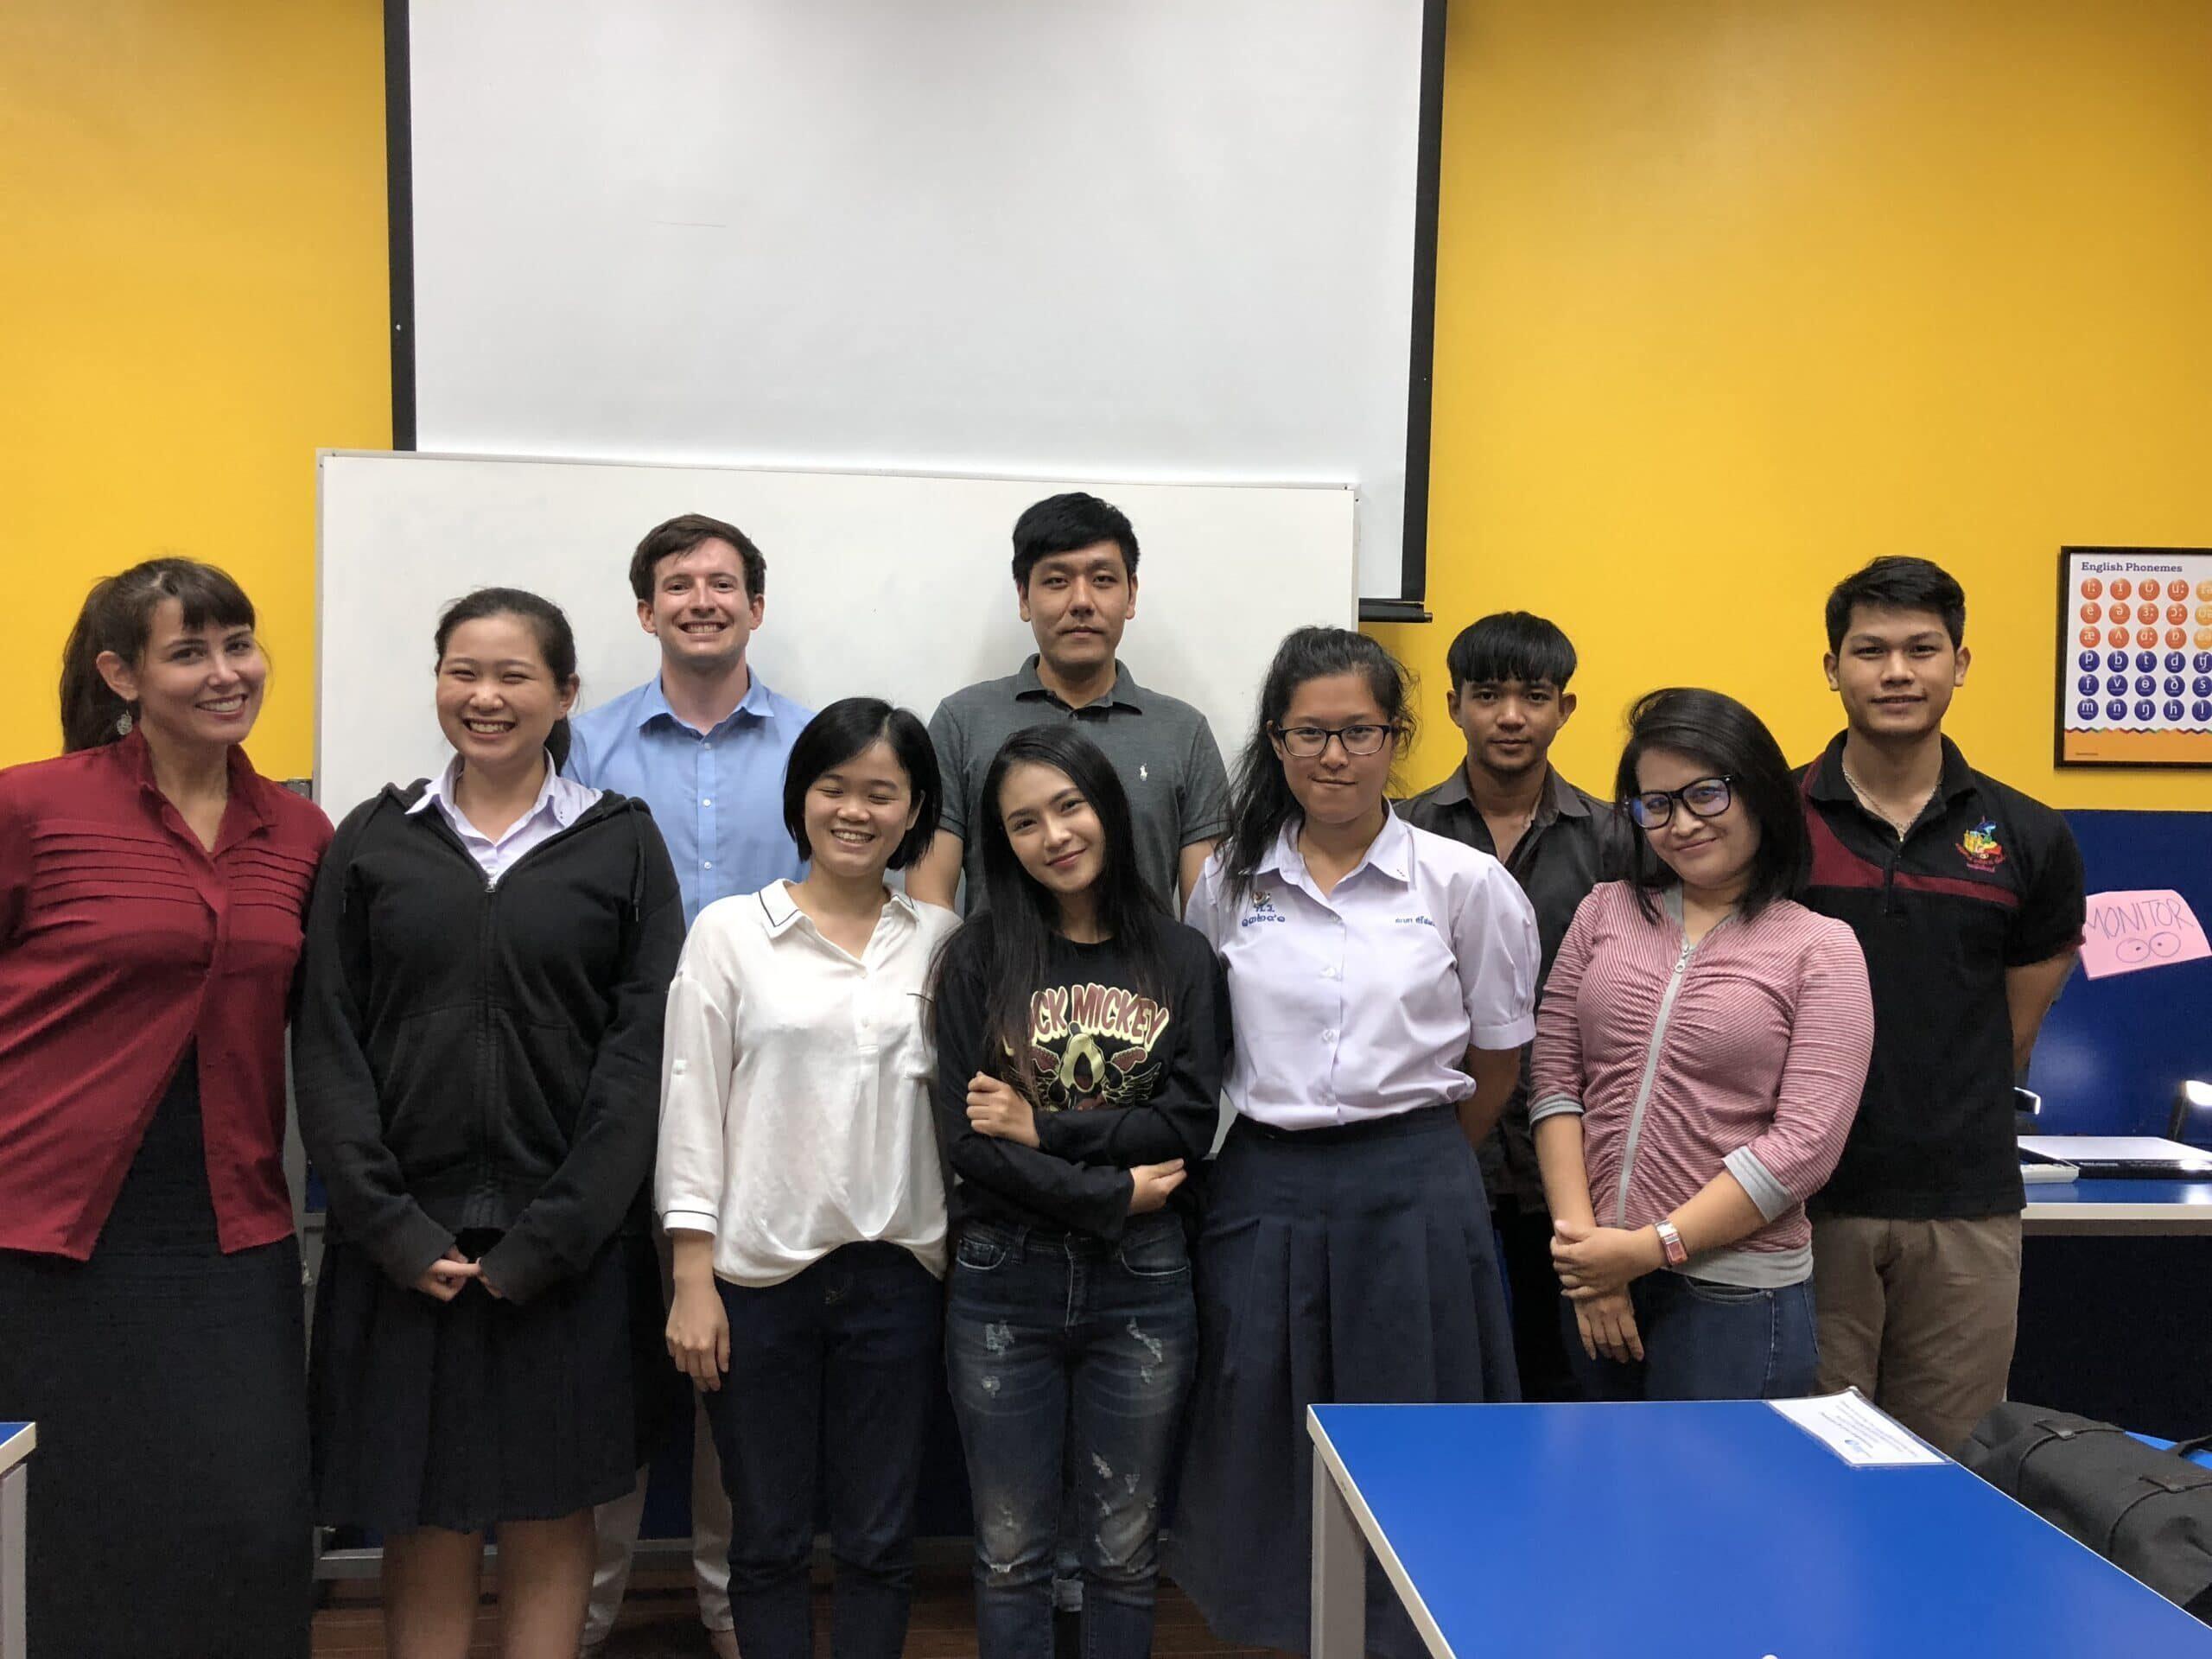 Students 7 – IH Chiang Mai